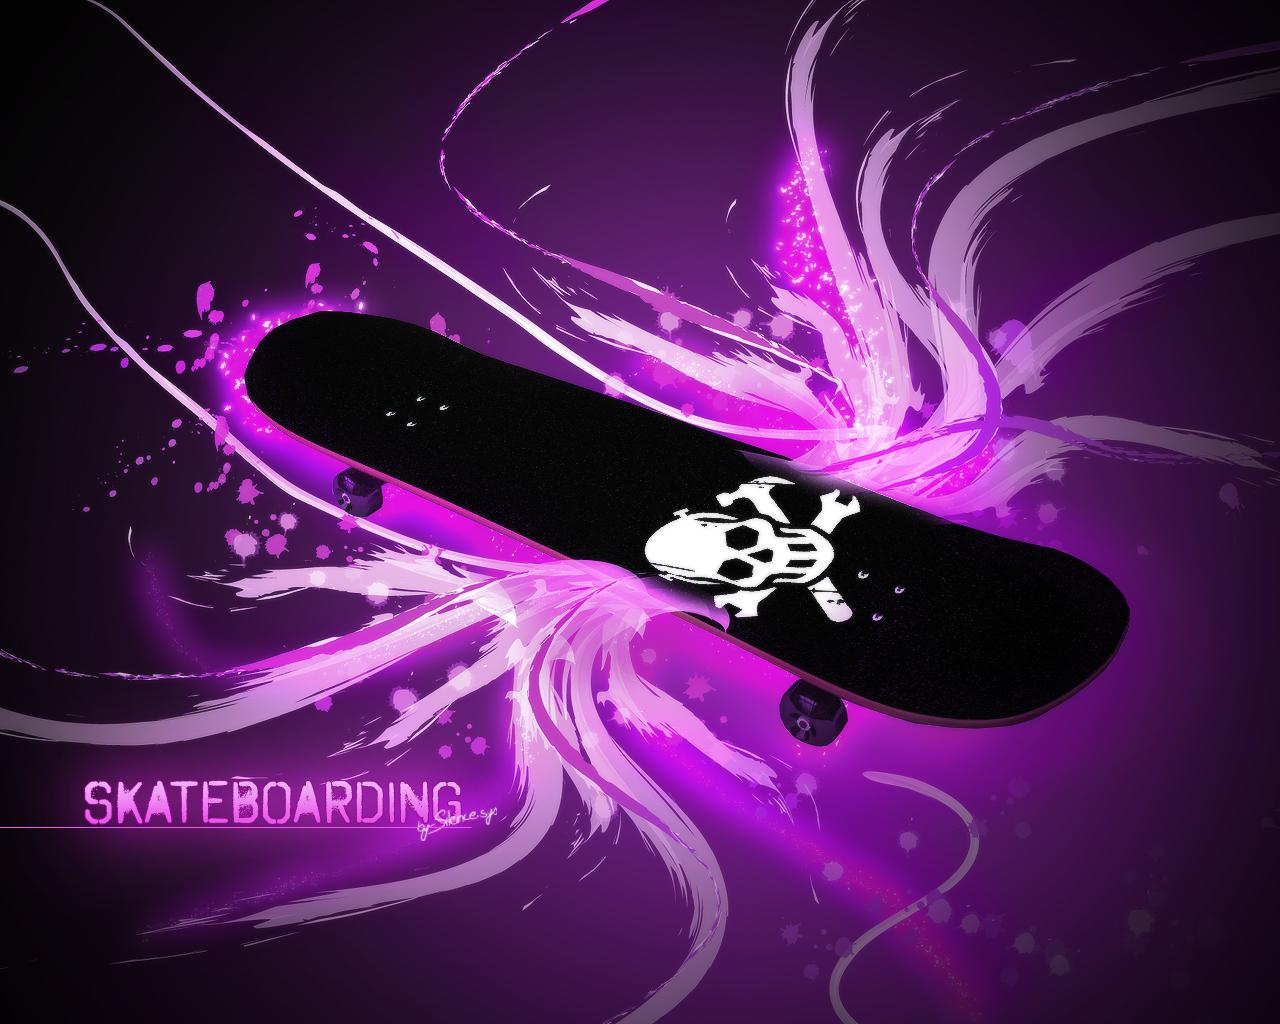 Cool Skateboarding 1280 X 1024 766 Kb Jpeg HD Wallpapers   100 1280x1024